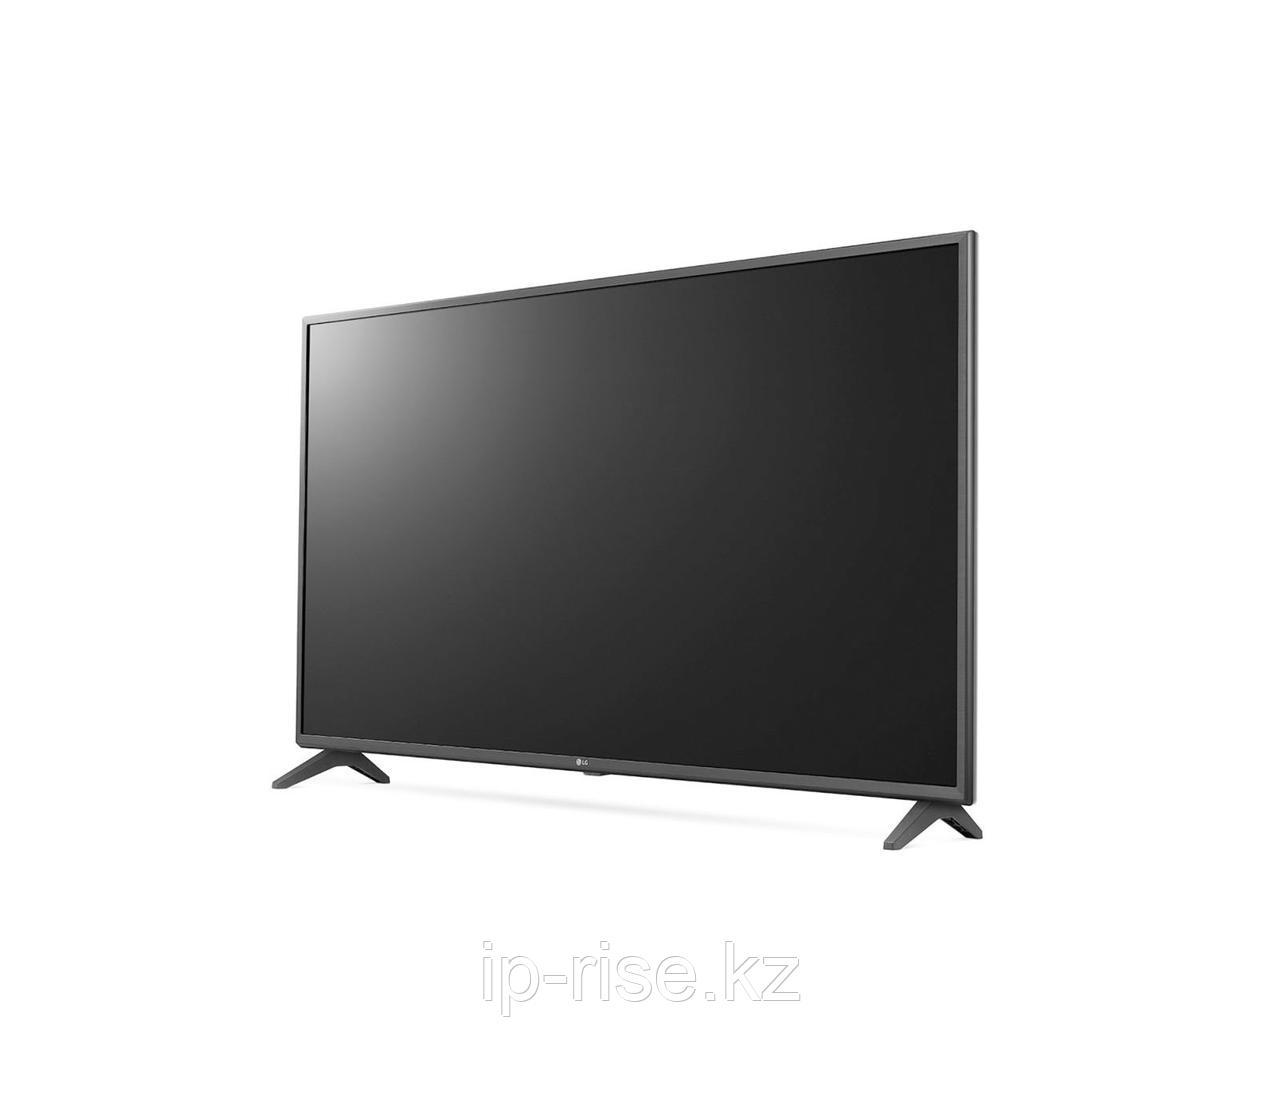 Телевизор LG 43UN74006LA, черный - фото 2